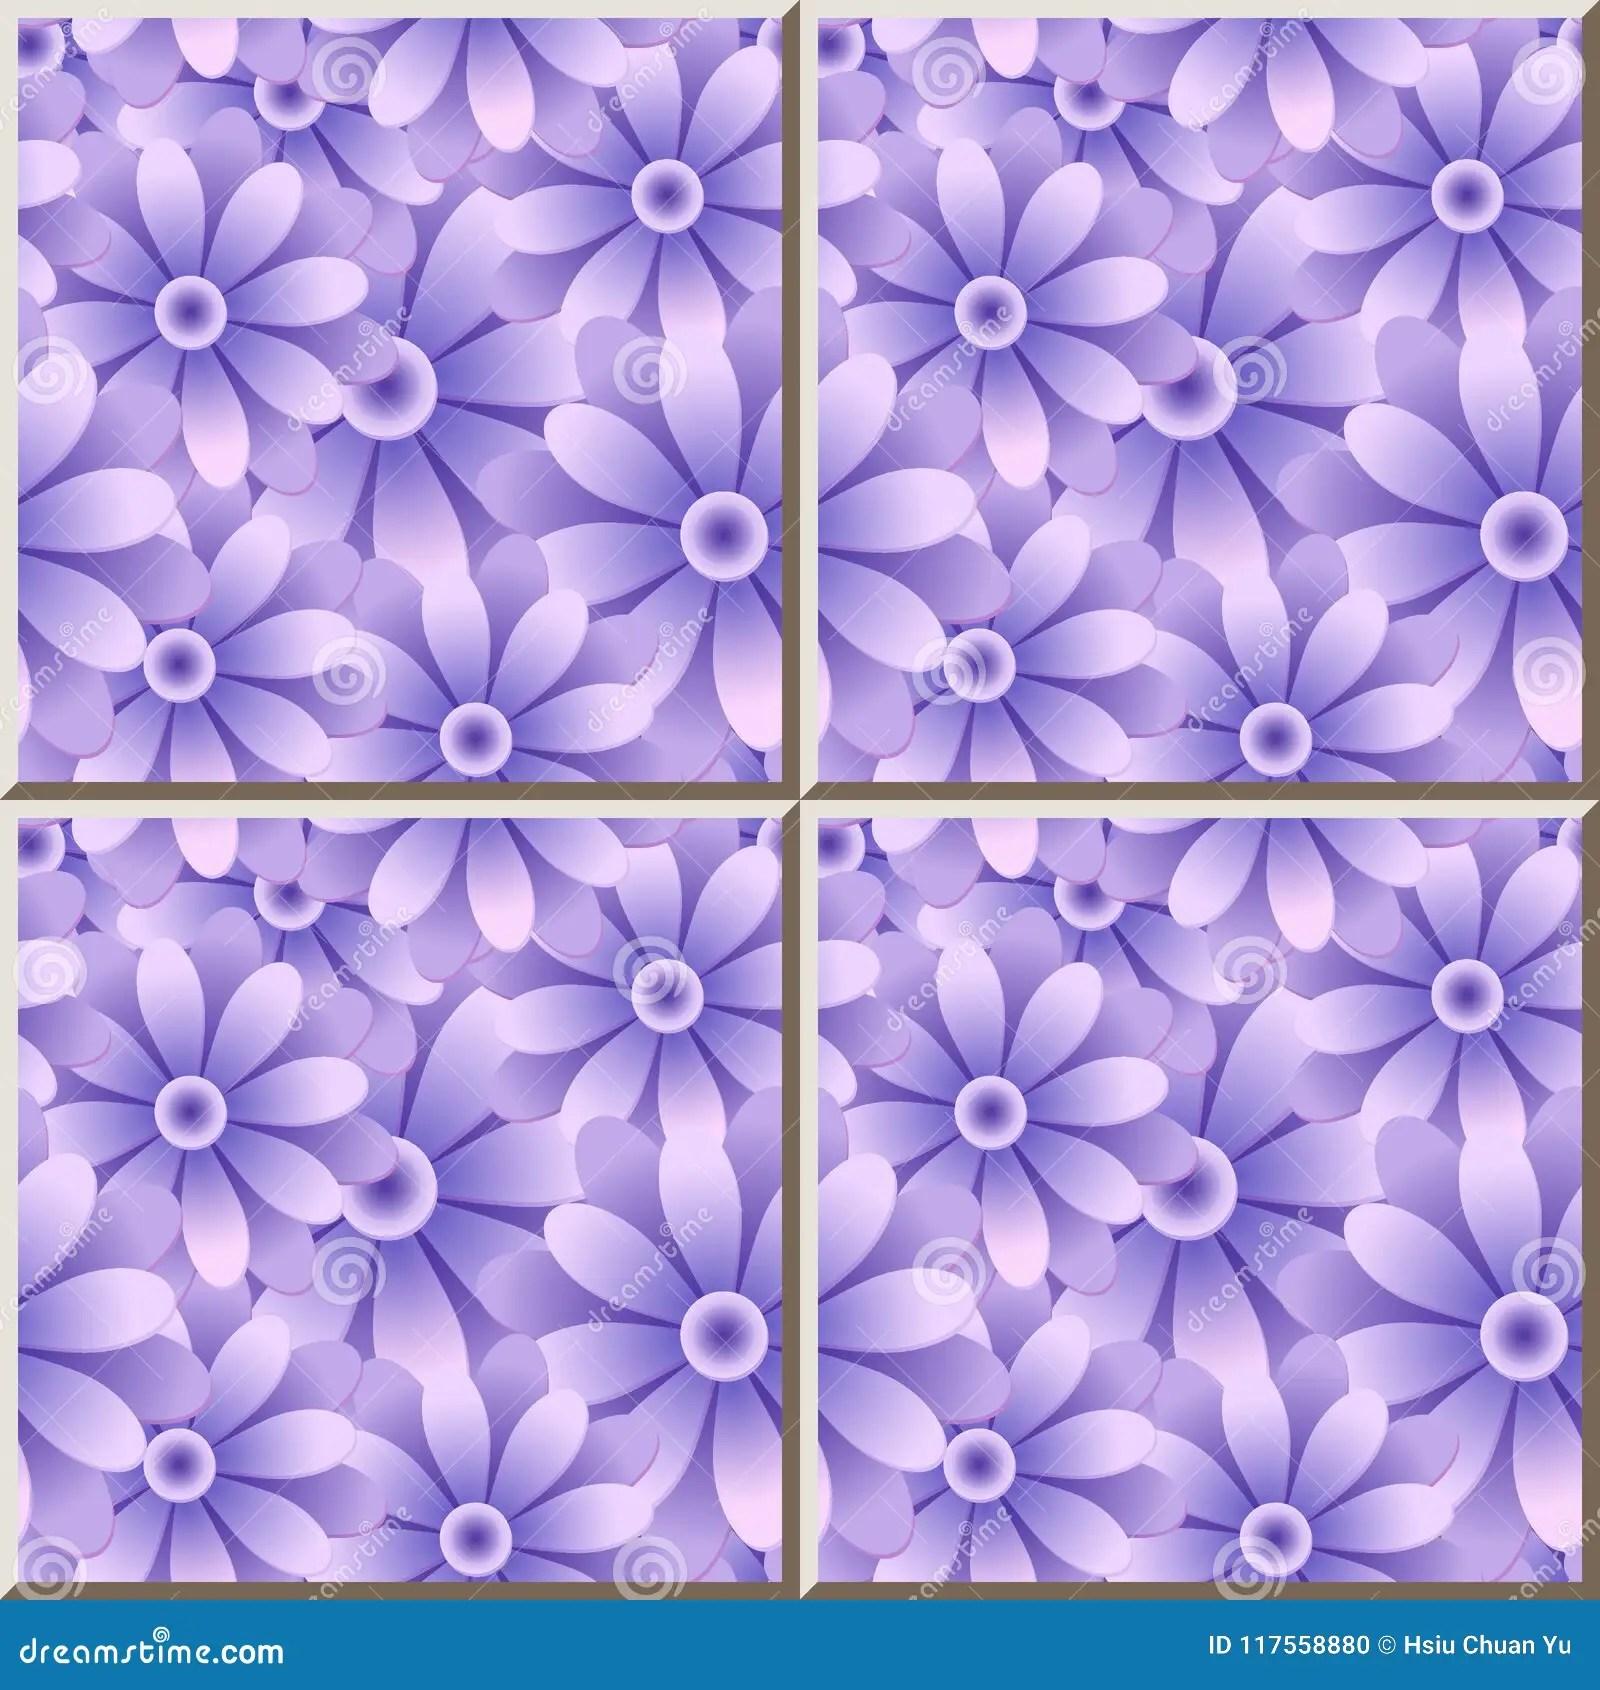 https www dreamstime com ceramic tile pattern purple blue round daisy garden flower ceramic tile pattern purple blue round daisy garden flower oriental image117558880